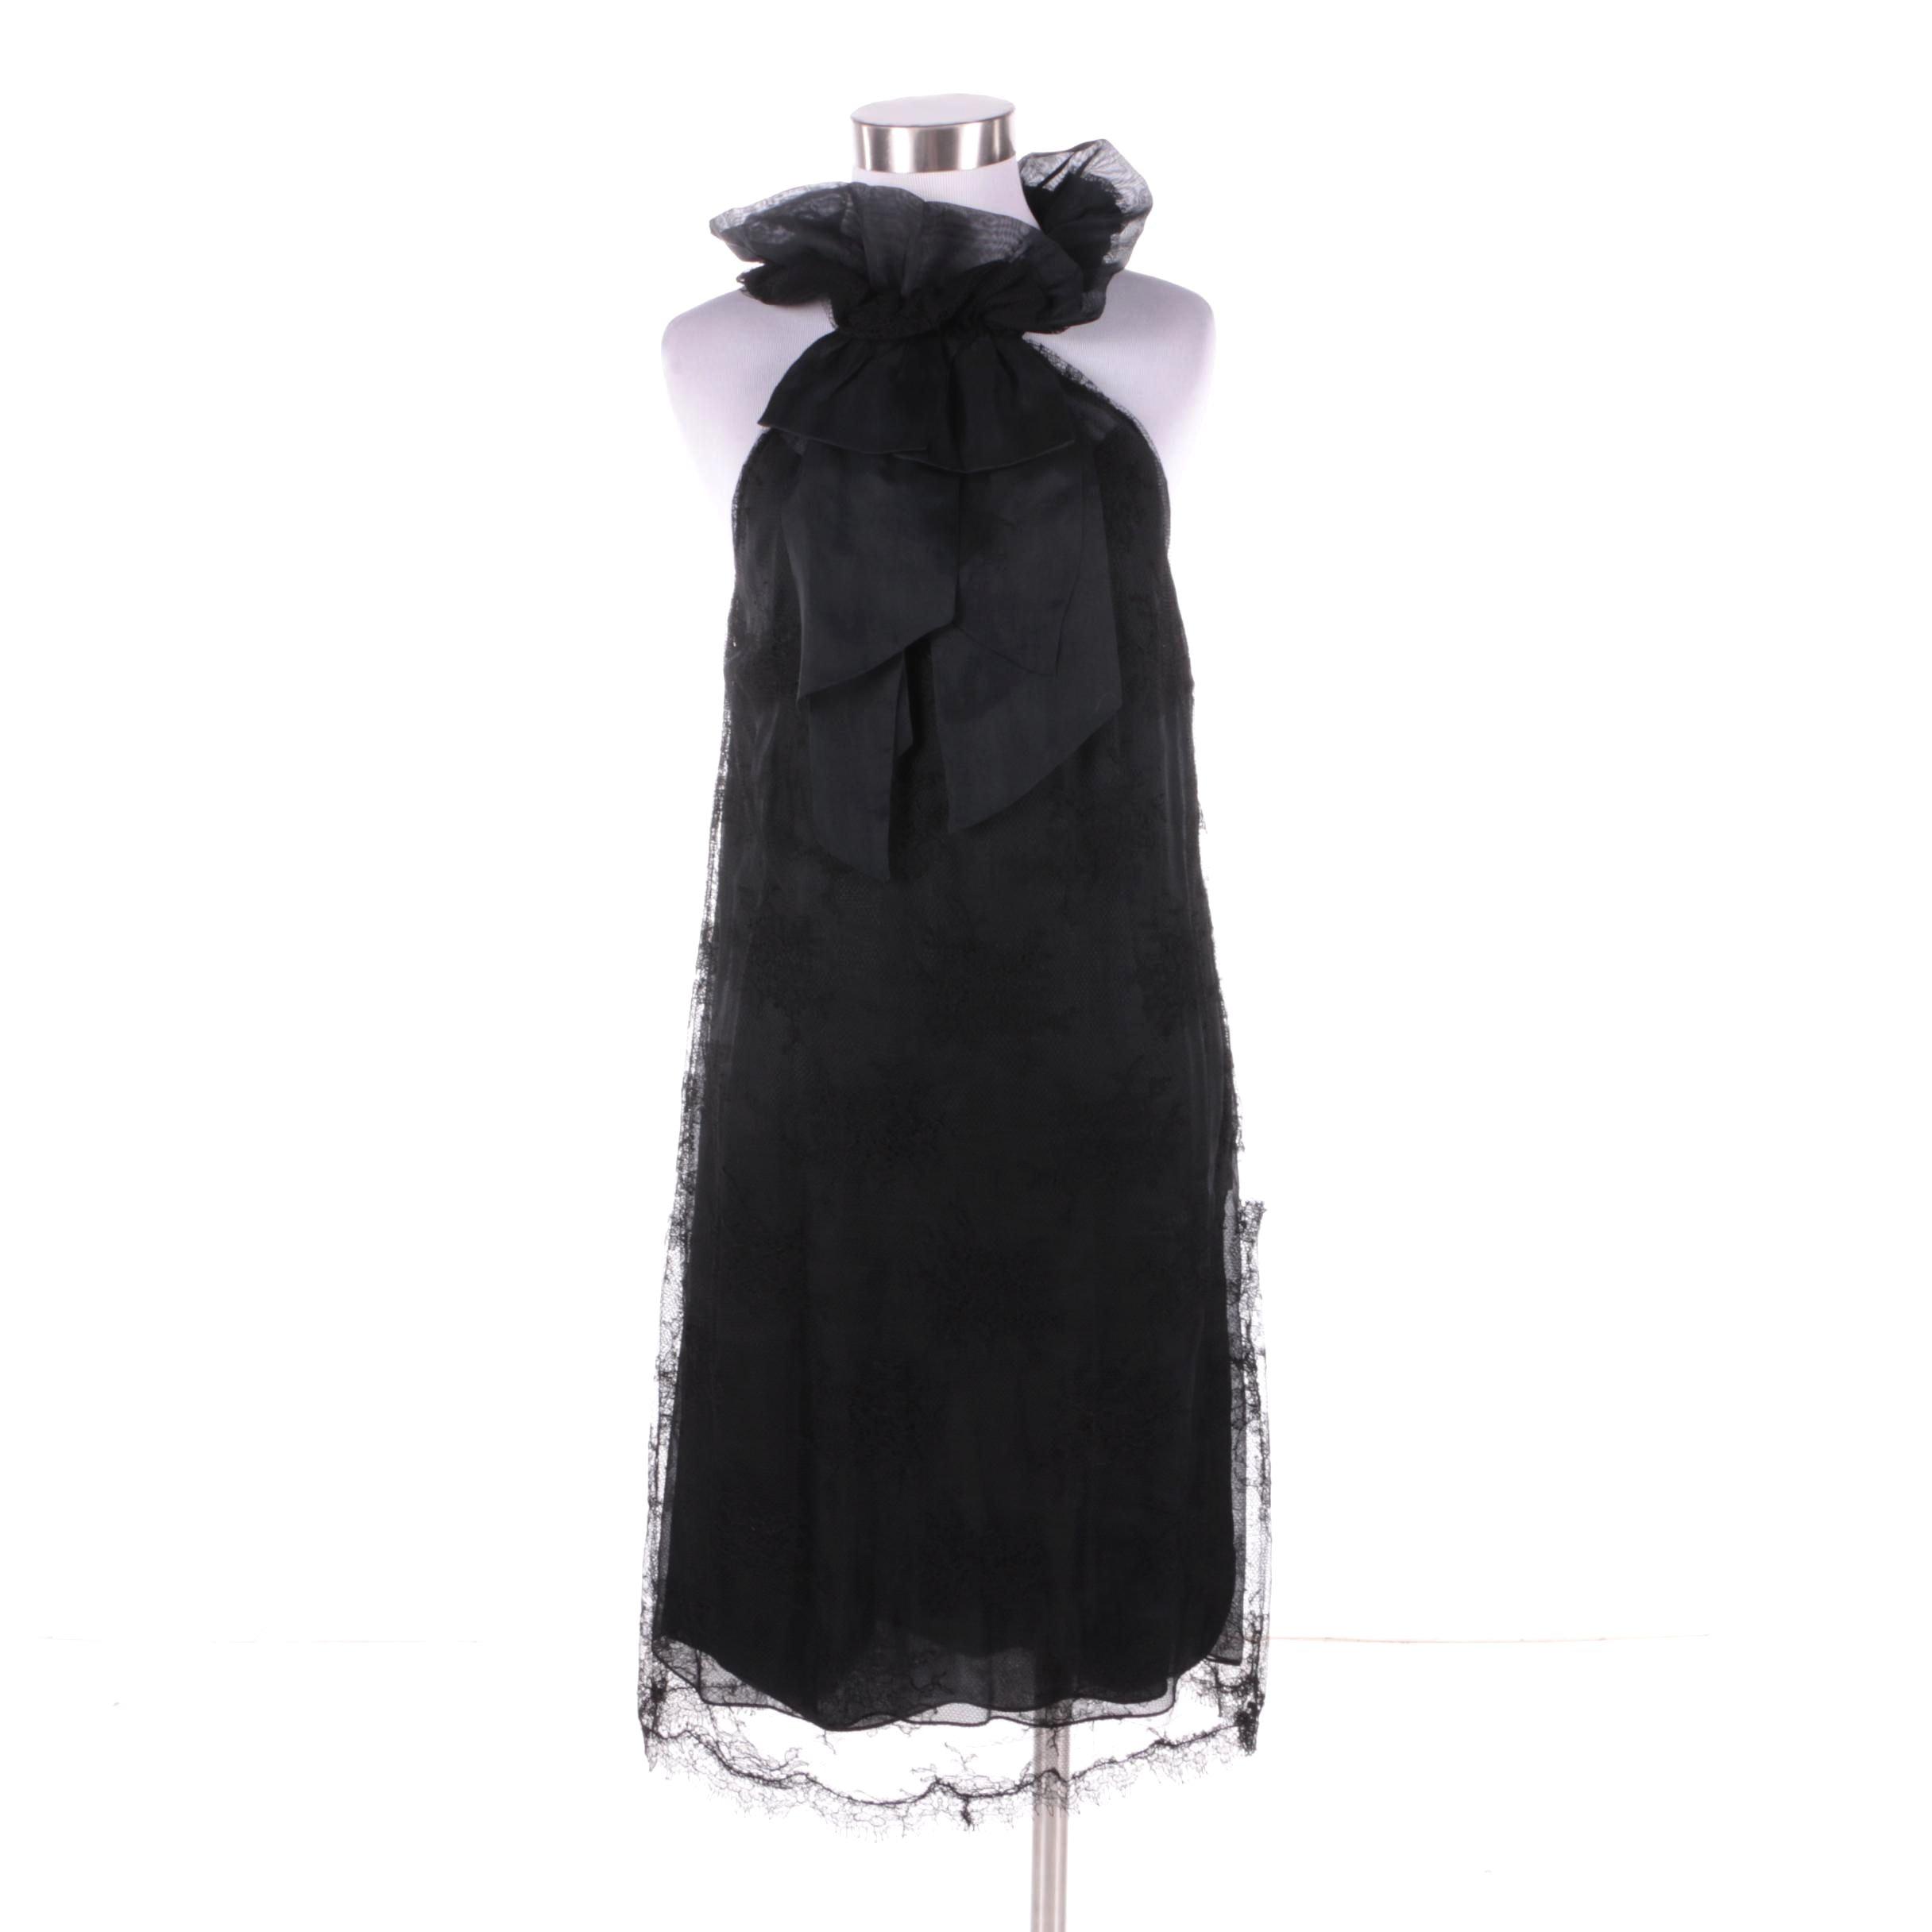 Monique Lhullier Black Lace and Silk Ribbon Neck Halter Dress